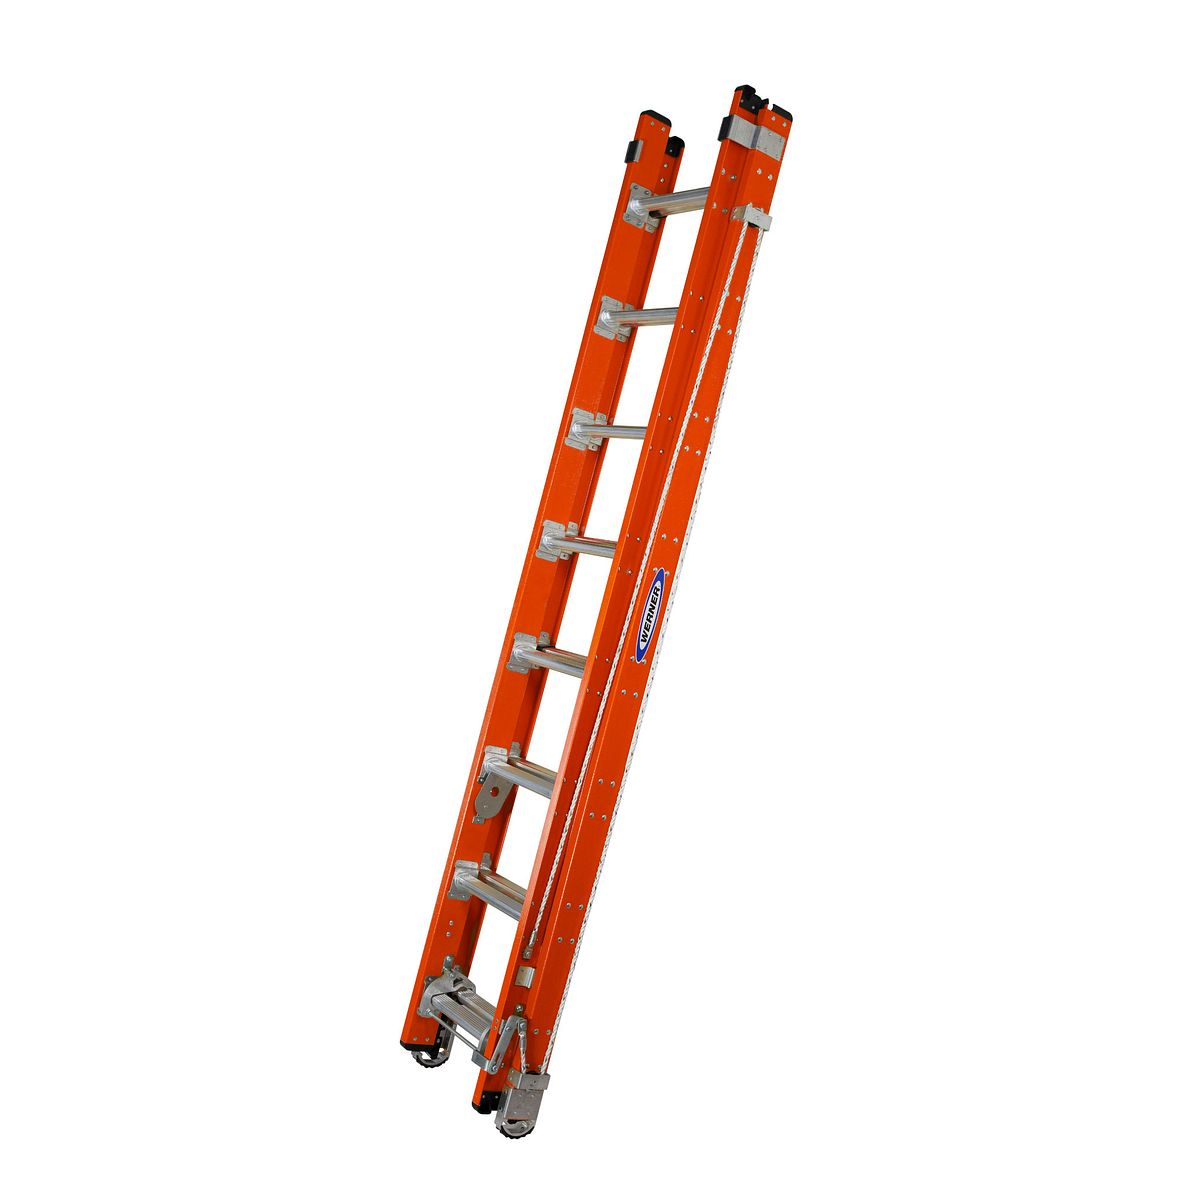 77625 Extension Ladders Werner Eu